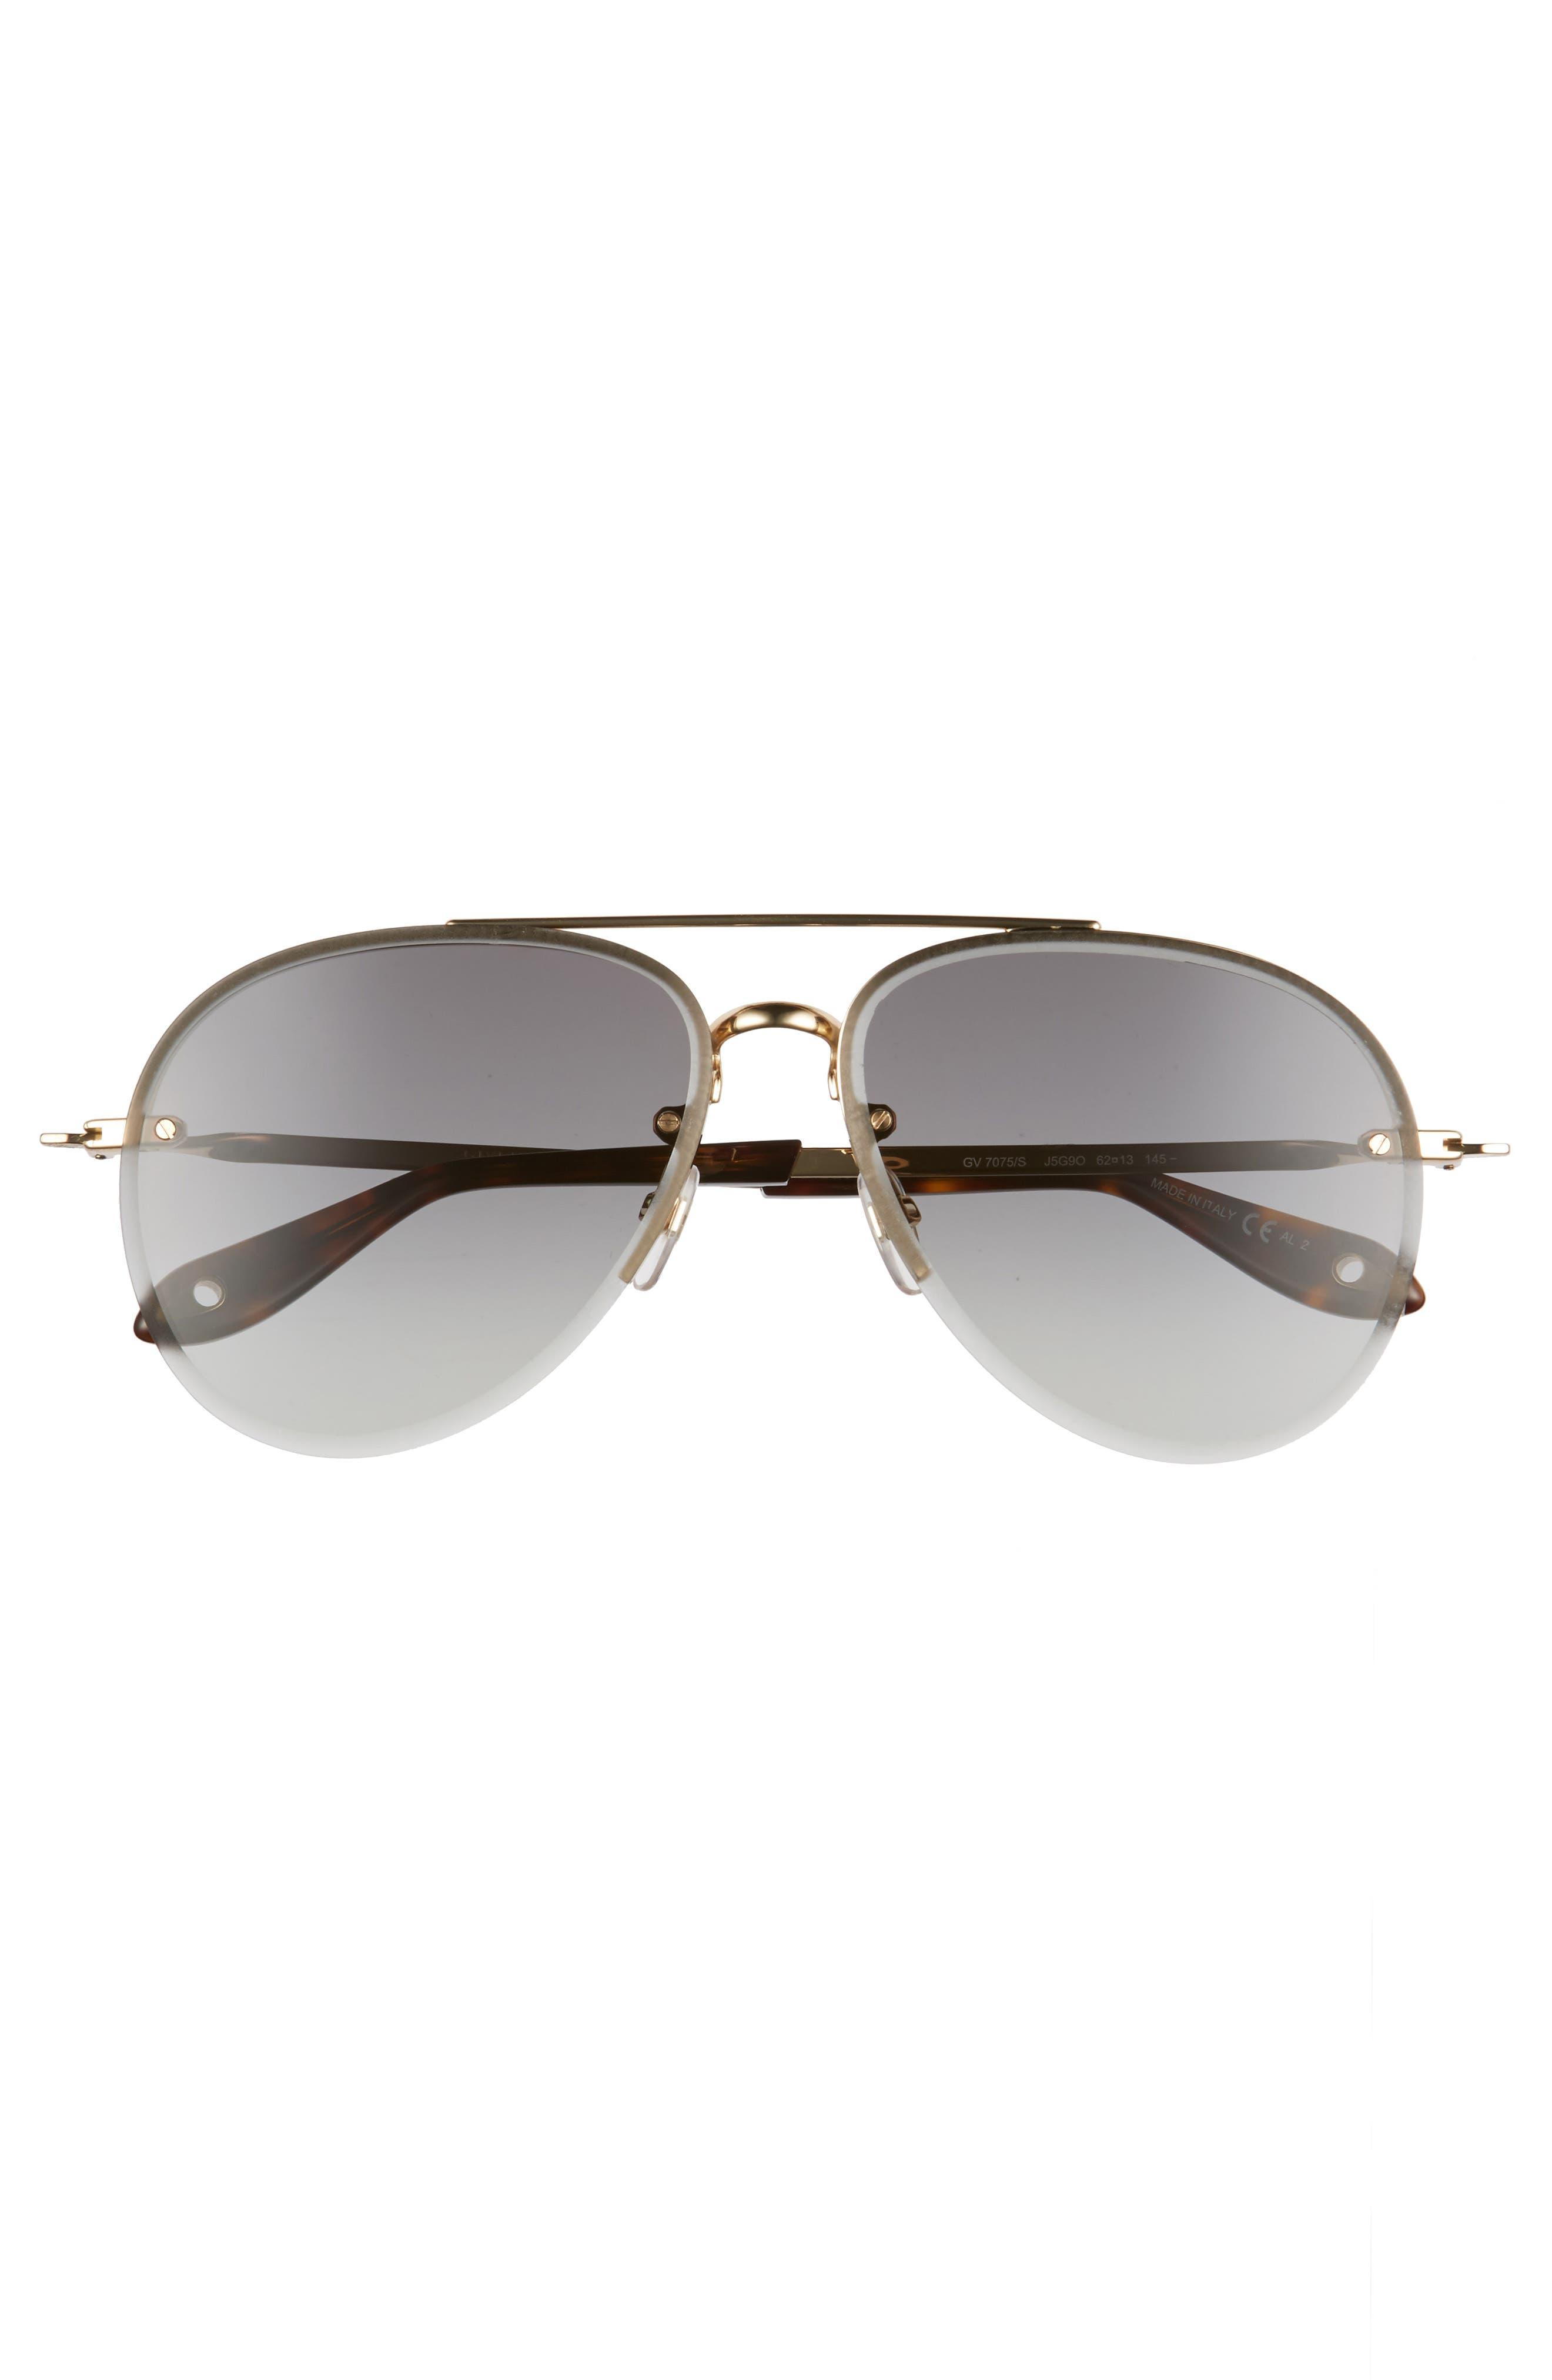 62mm Oversize Aviator Sunglasses,                             Alternate thumbnail 3, color,                             Gold